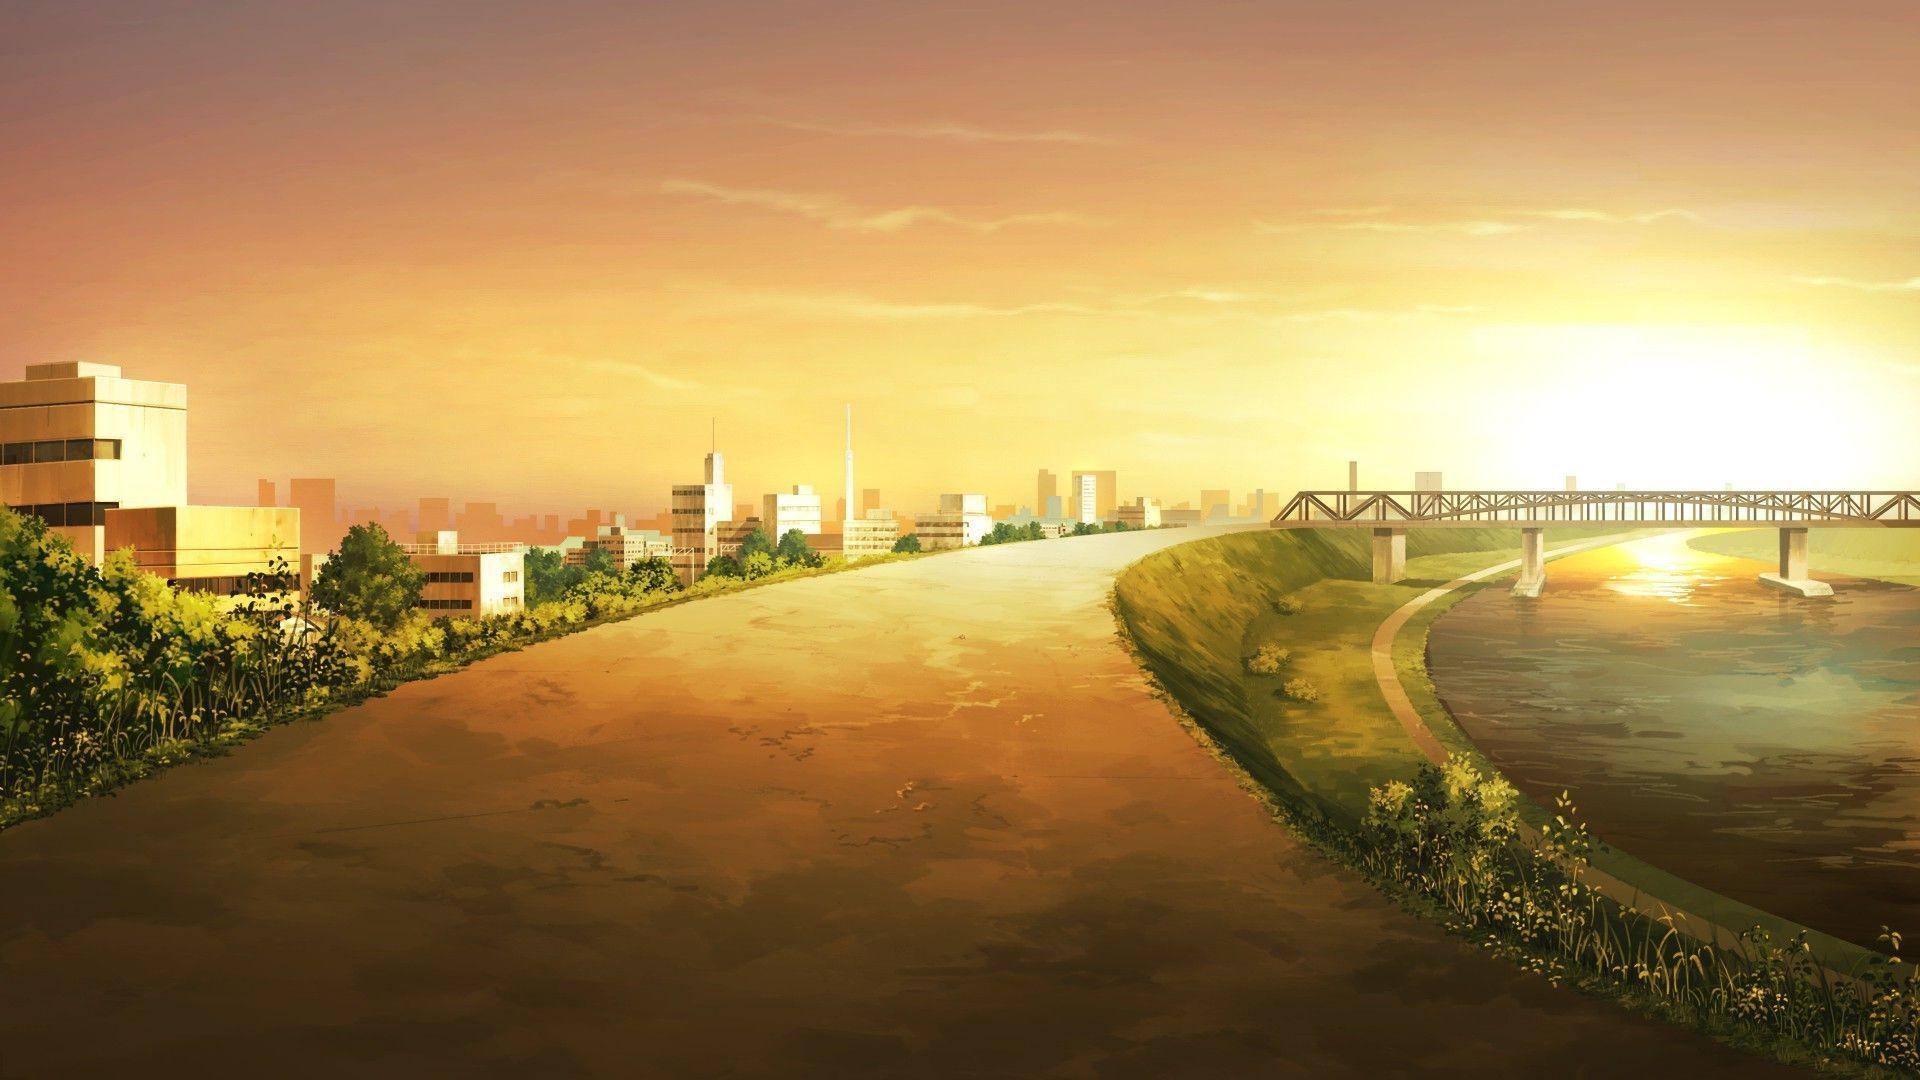 Anime City Desktop Wallpaper 50841